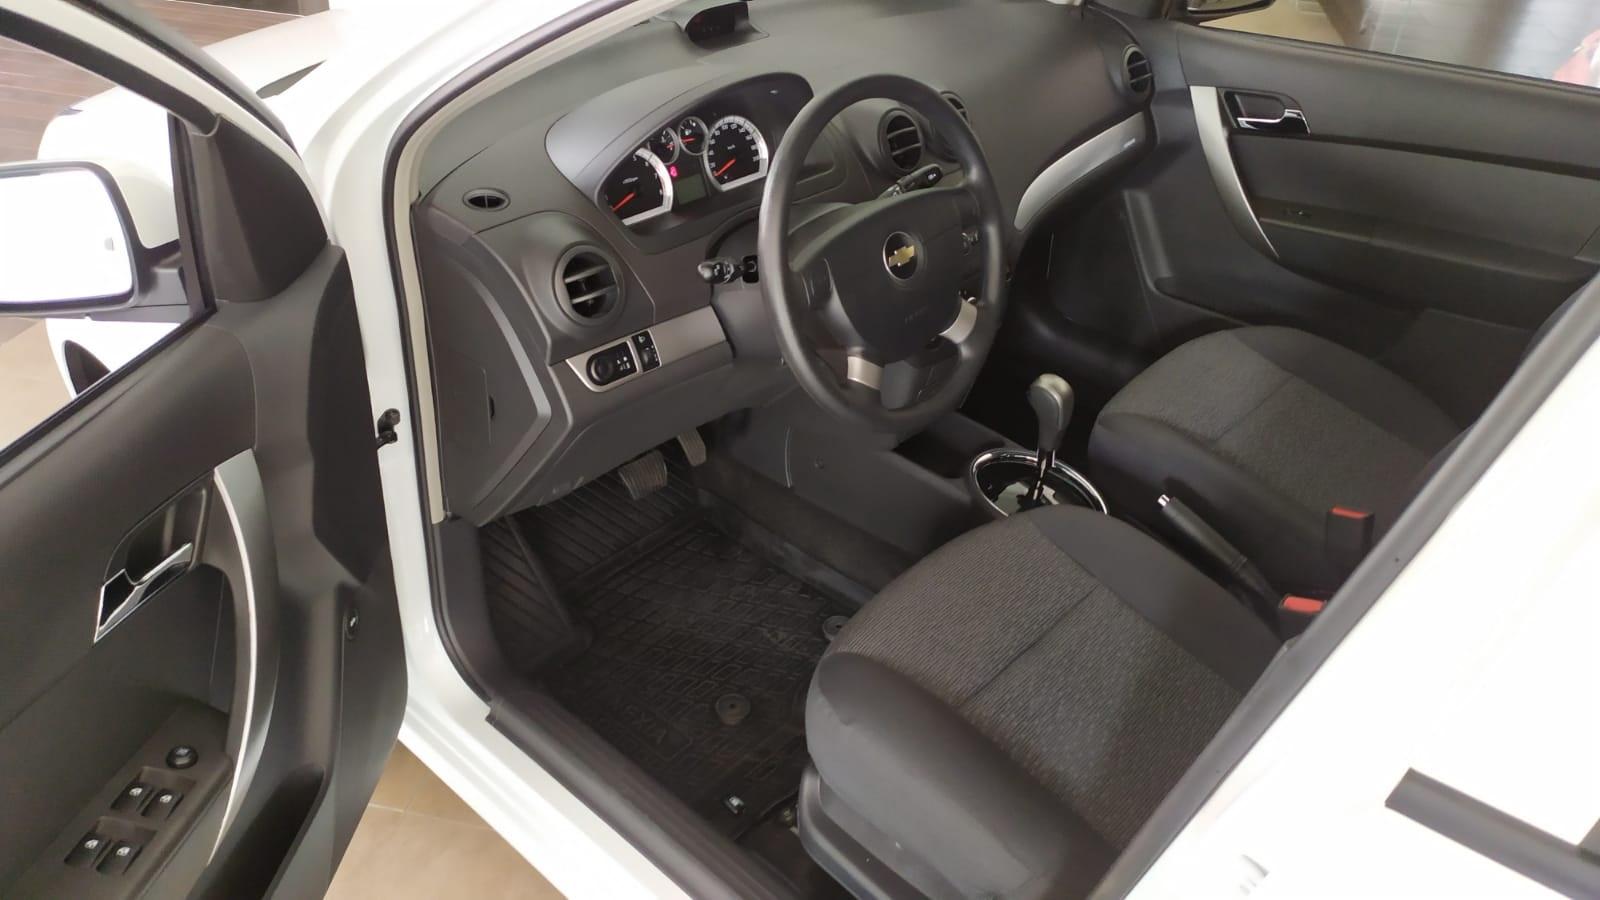 Chevrolet Nexia 1.5 16 кл. (105 л.с.) 6АТ, комплектации LT, Белый. 2021